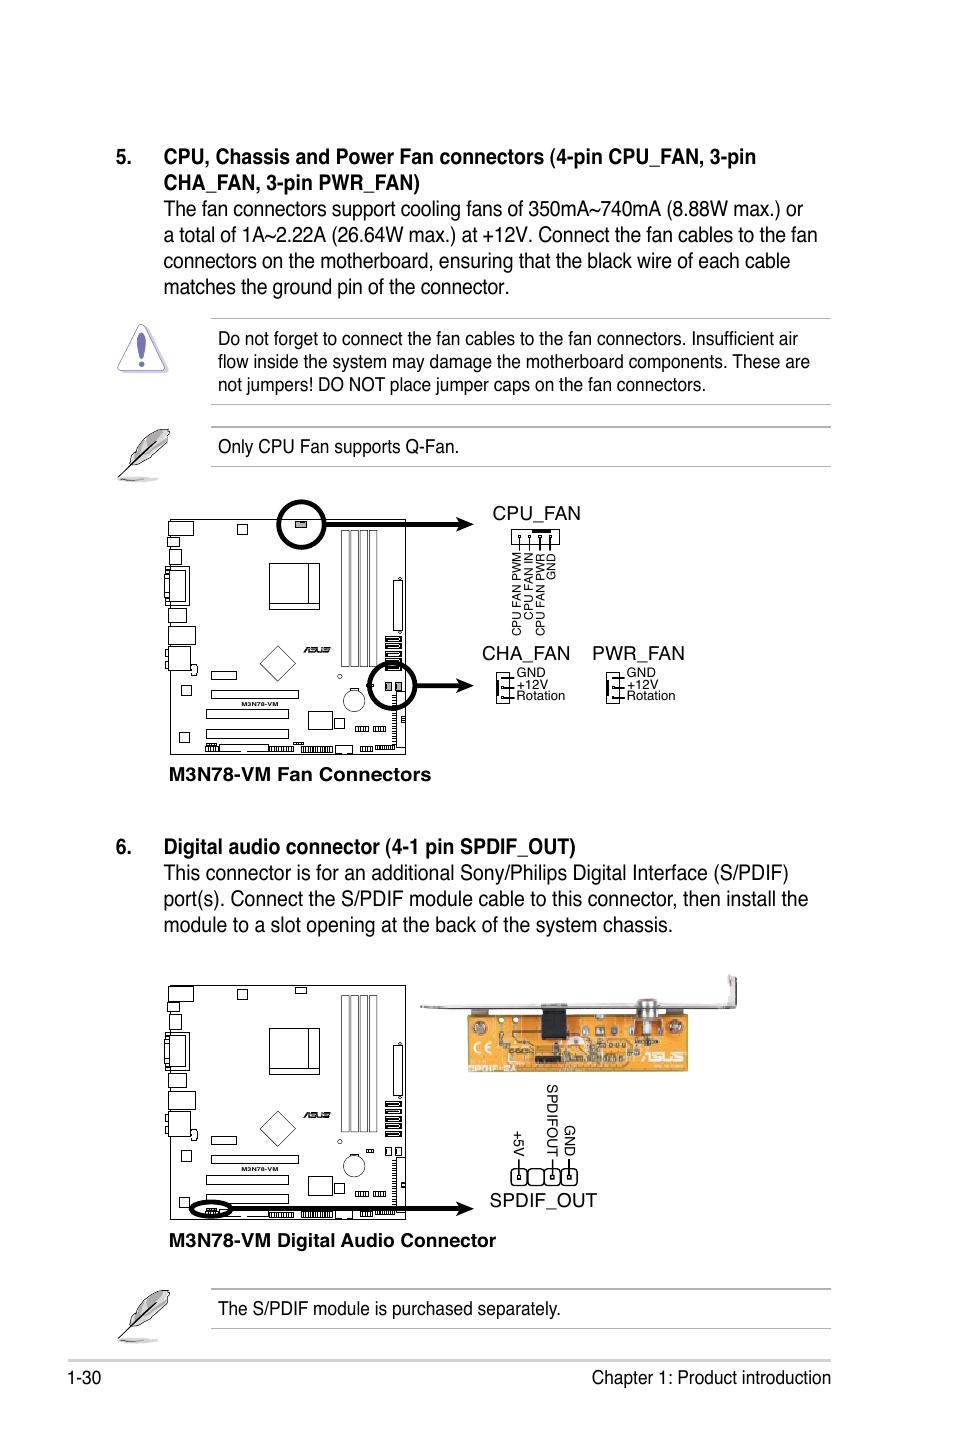 Asus M3N78-VM User Manual | Page 42 / 106 on 4 pin switch diagram, 4 pin adapter diagram, 4 pin led diagram,